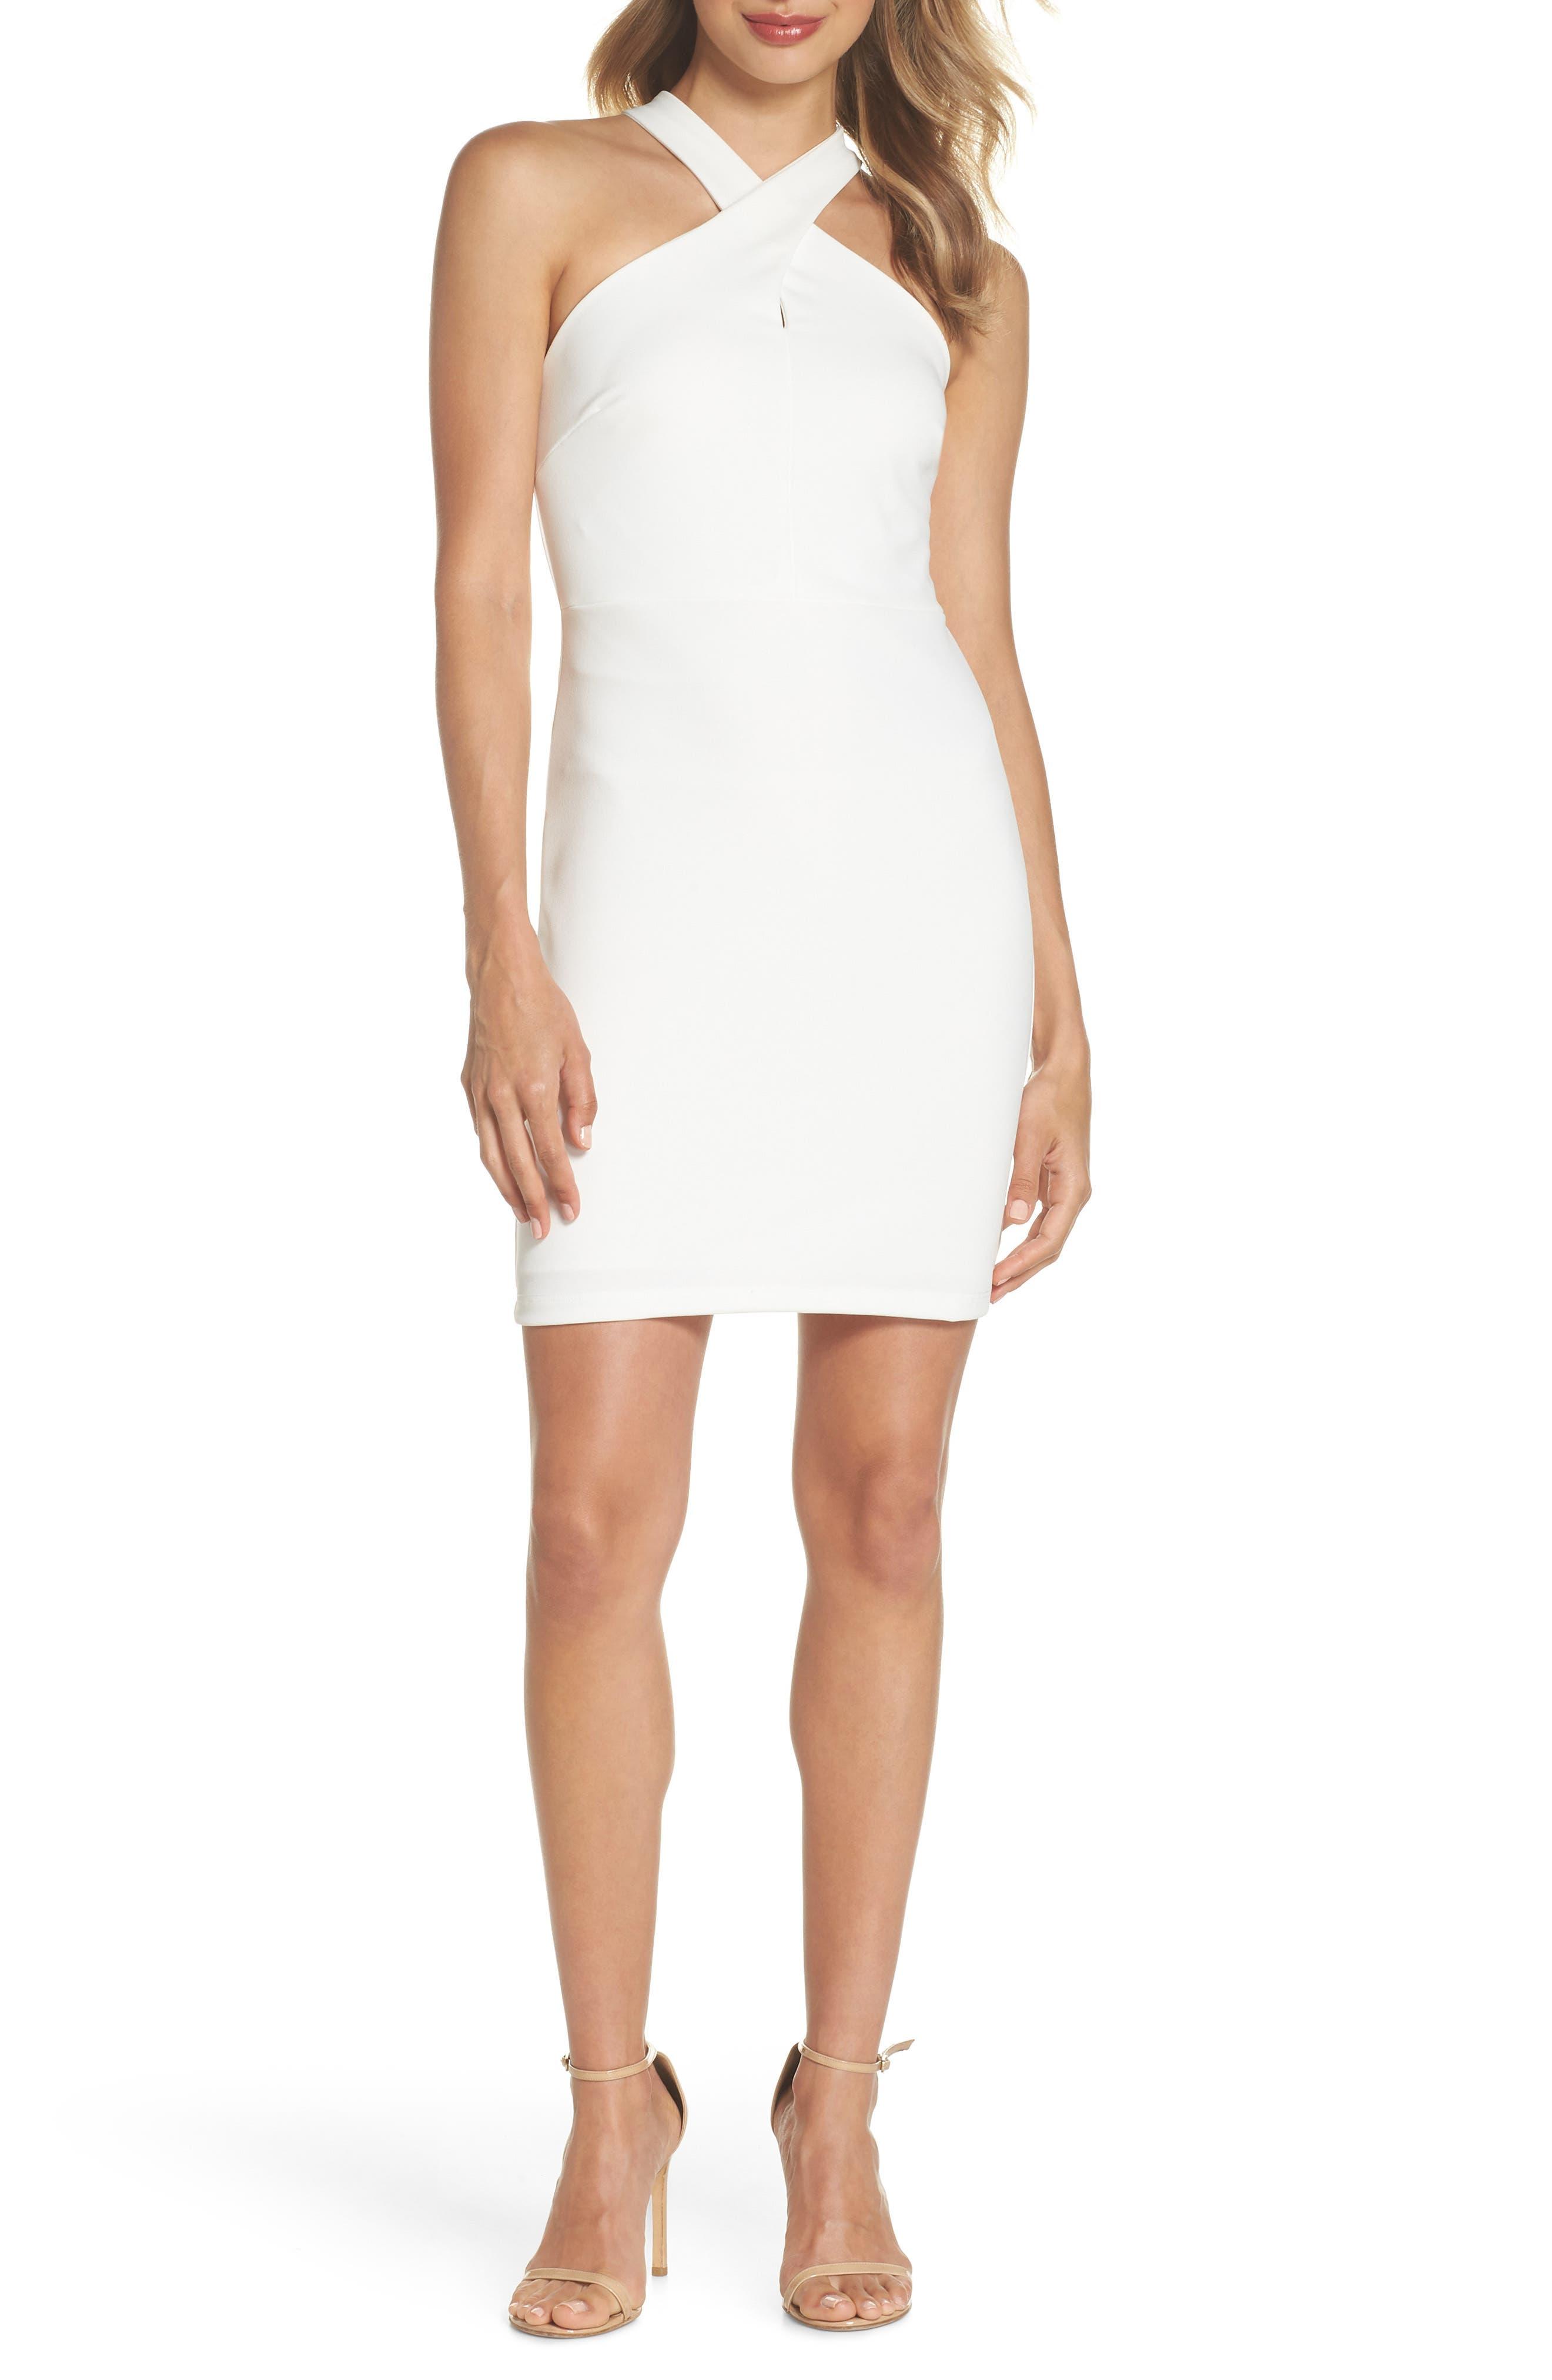 Lulus Thrive Racerback Minidress, White